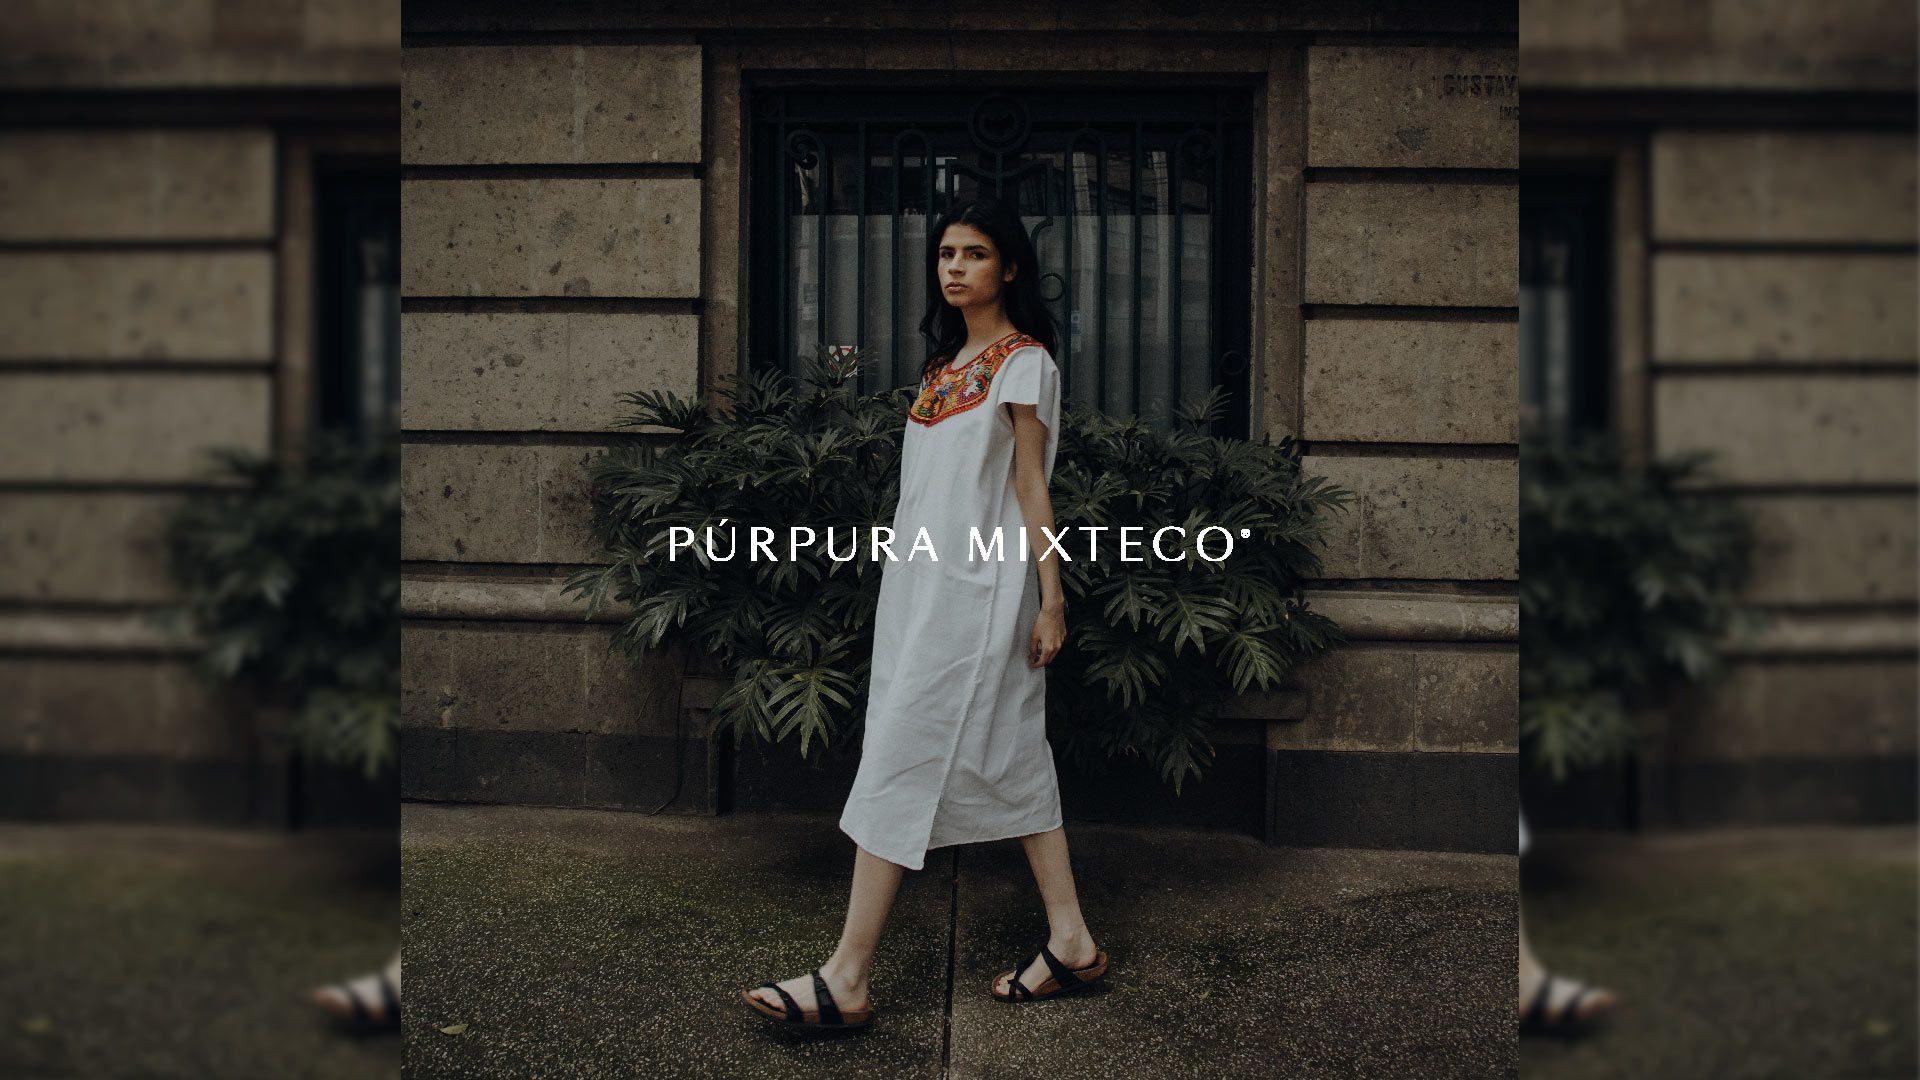 fashion-2021-purpura-mixteco